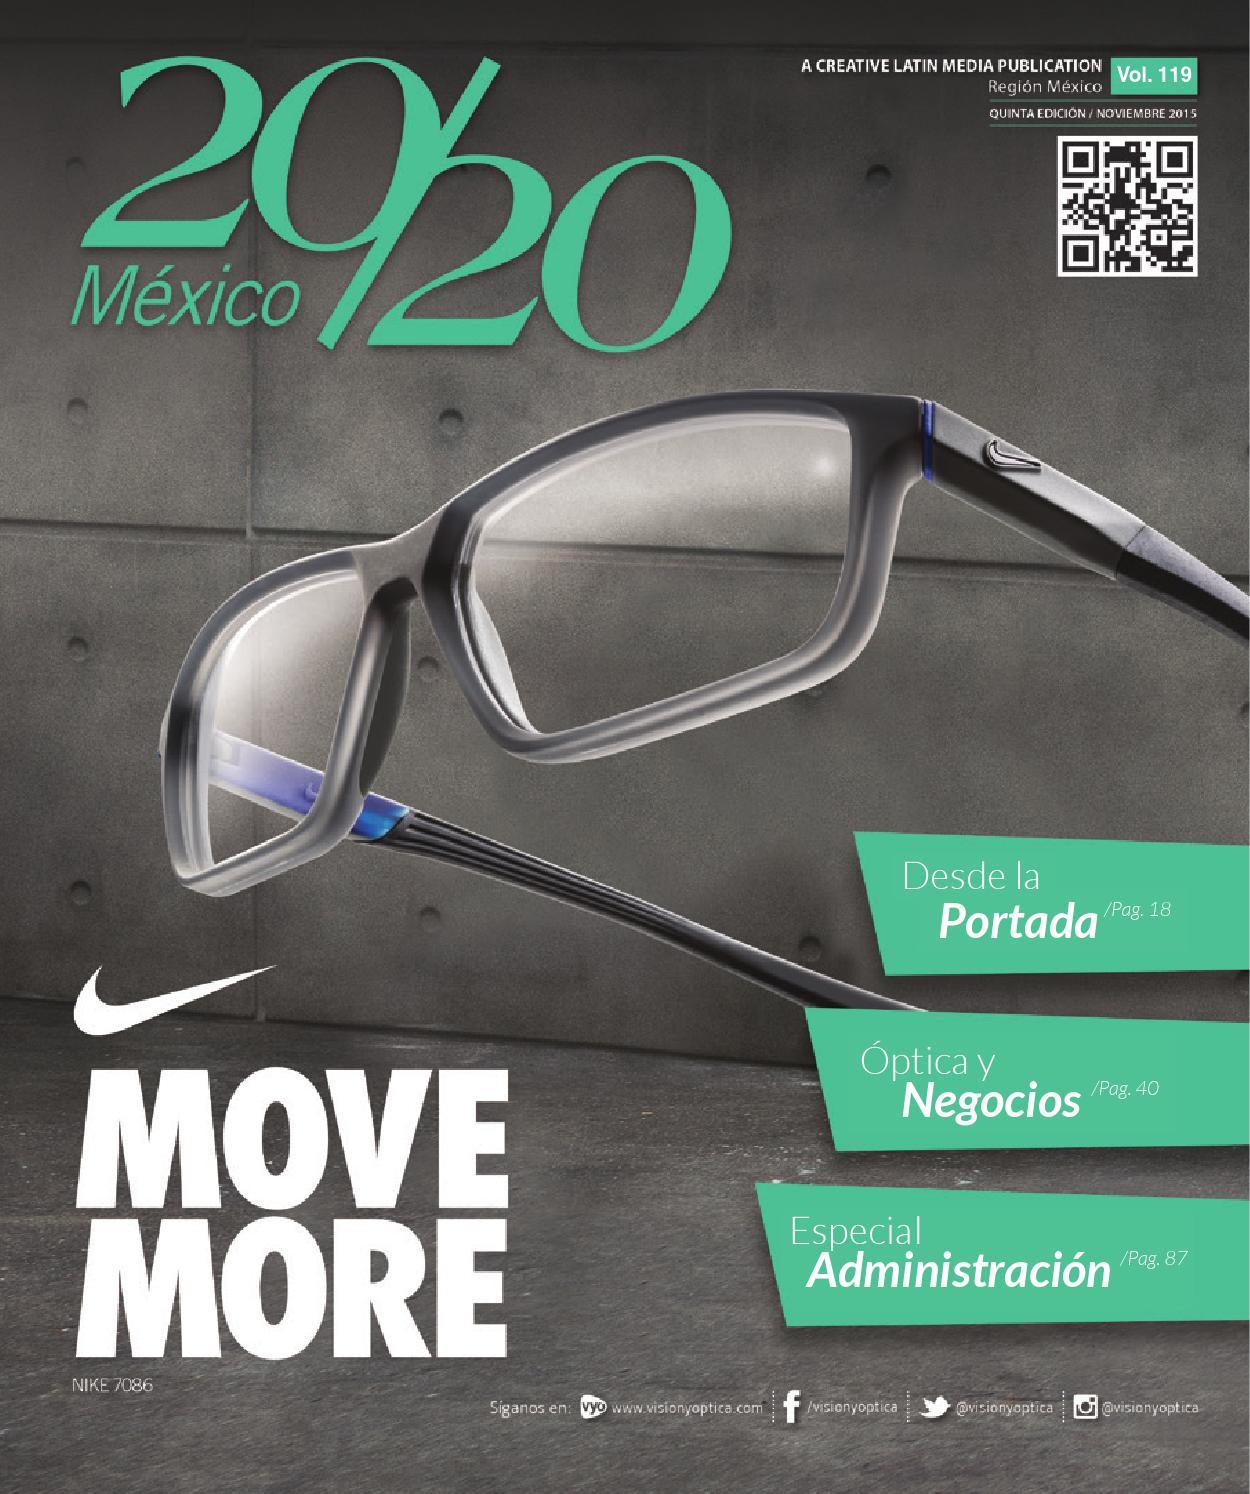 2020 5ta 2015 mx en baja by Creative Latin Media LLC - issuu